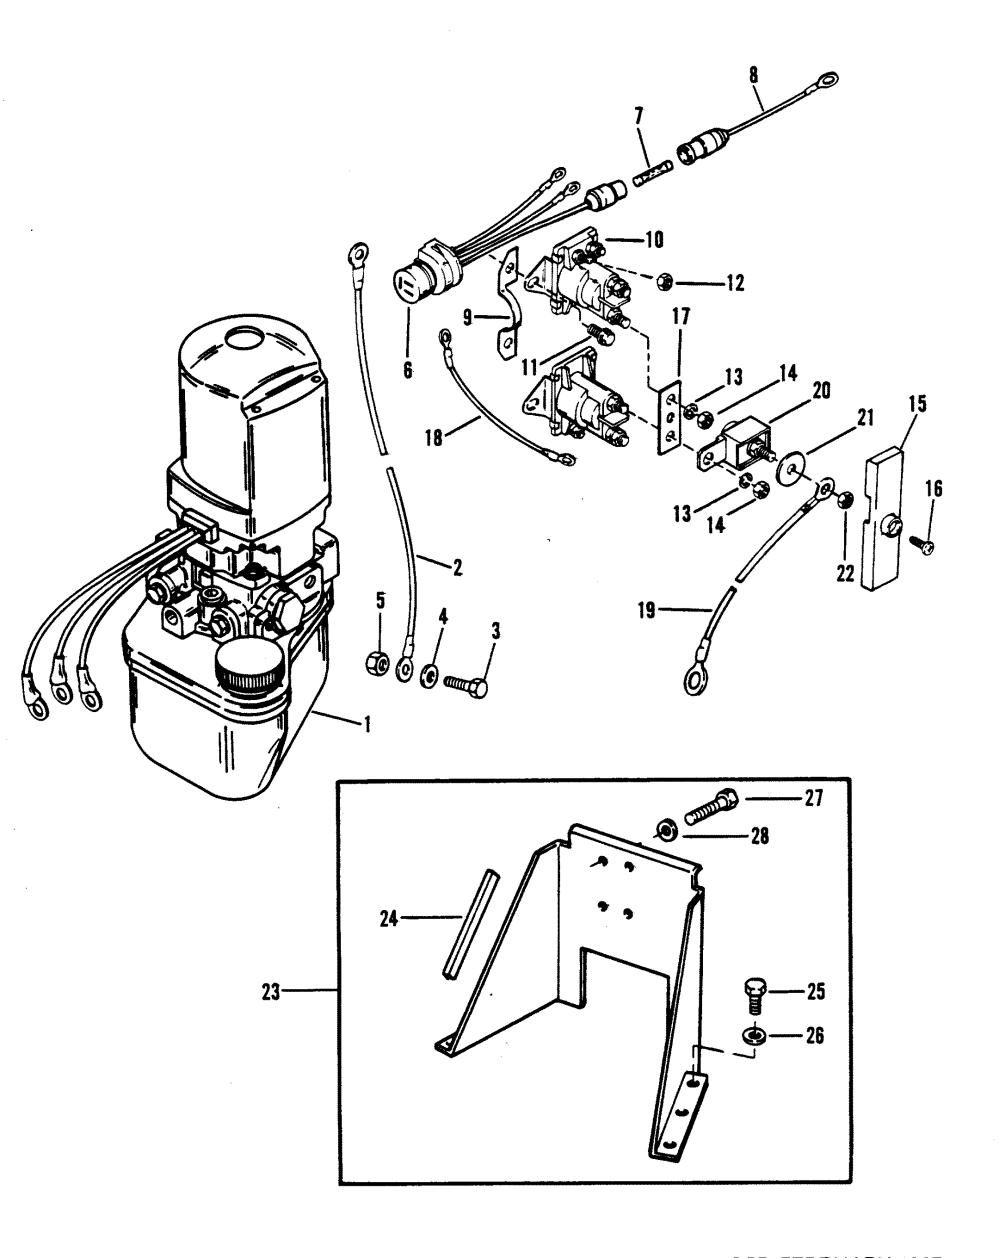 medium resolution of mercruiser trim wiring harness oildyne 38 wiring diagram mercruiser tilt trim wiring diagram mercruiser tilt trim